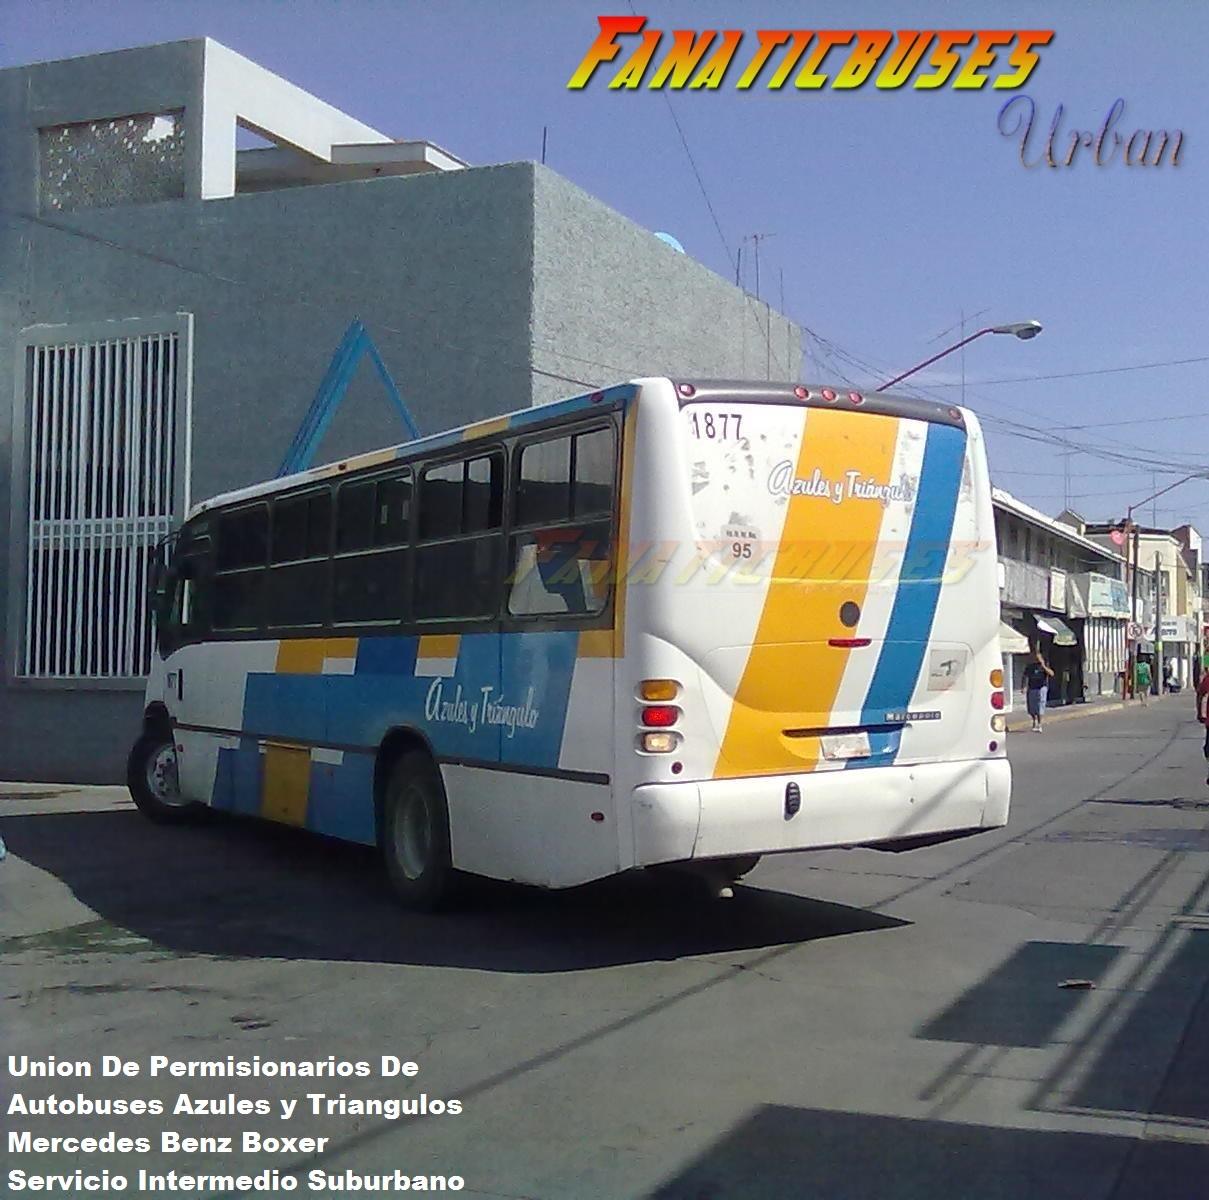 Fanaticbuses autobuses flecha amarilla - Autobuses larga distancia ...